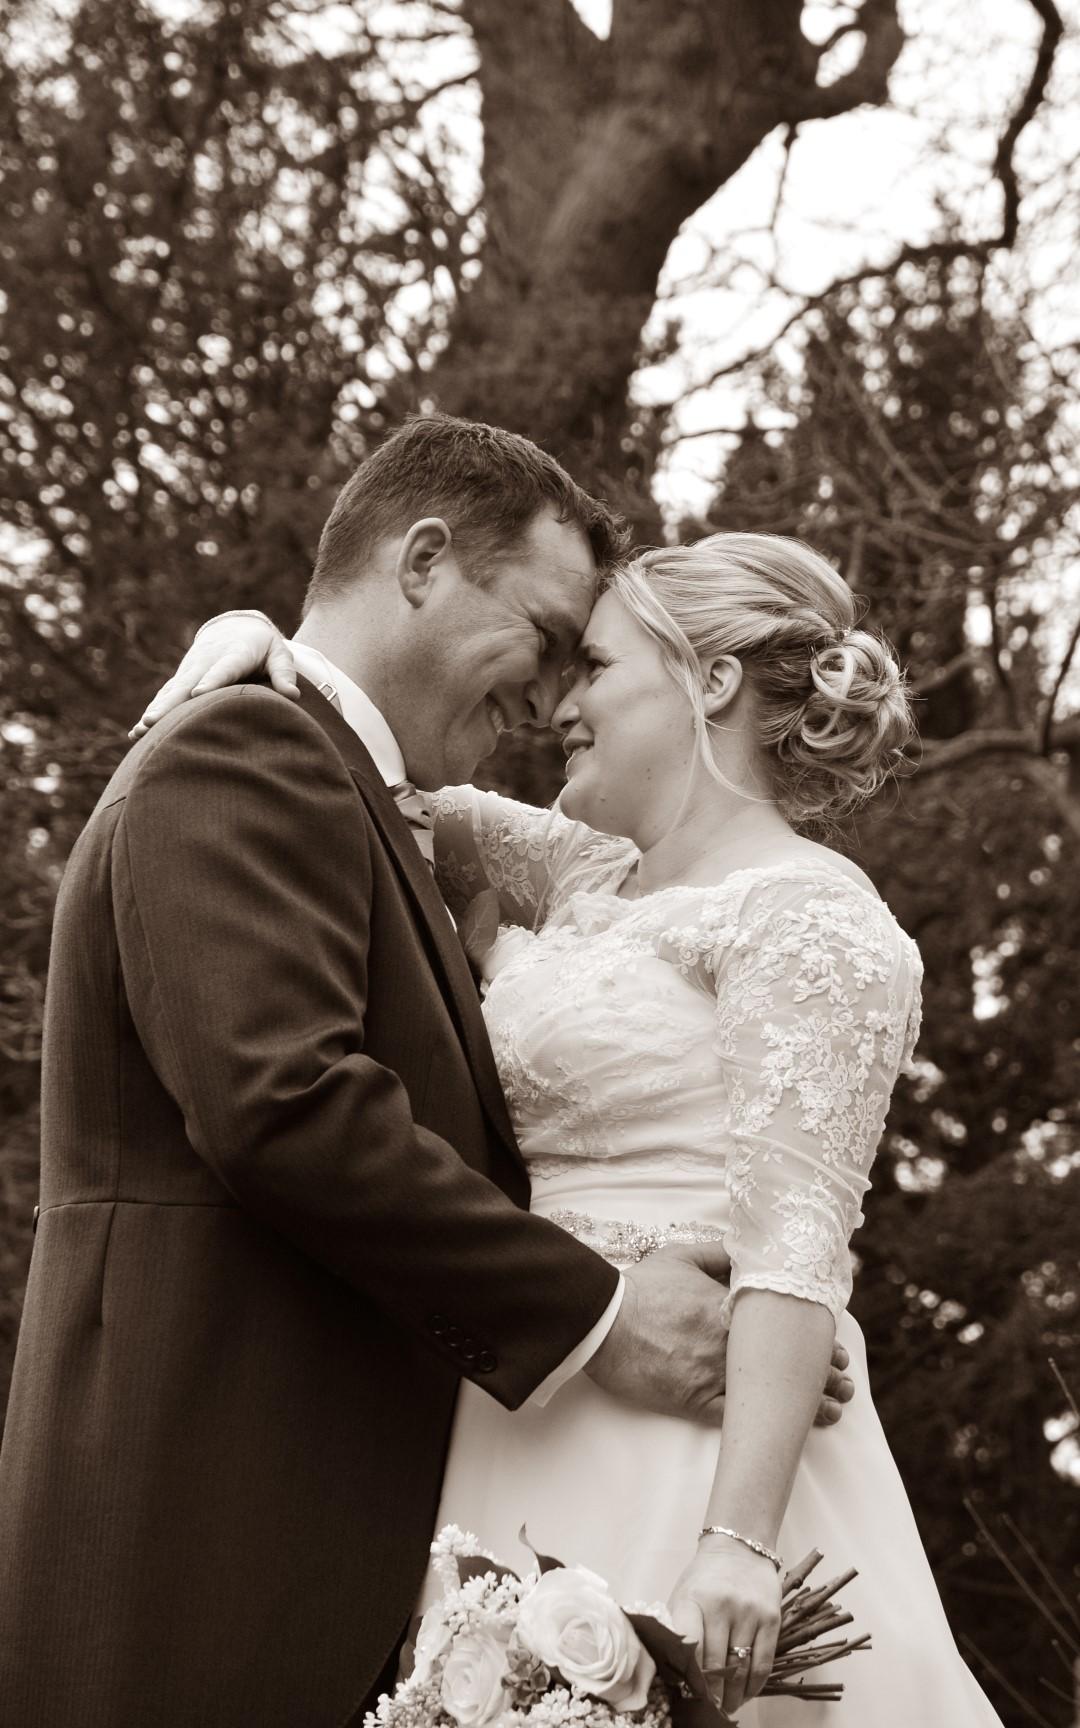 weddings-at-aldwark-photo